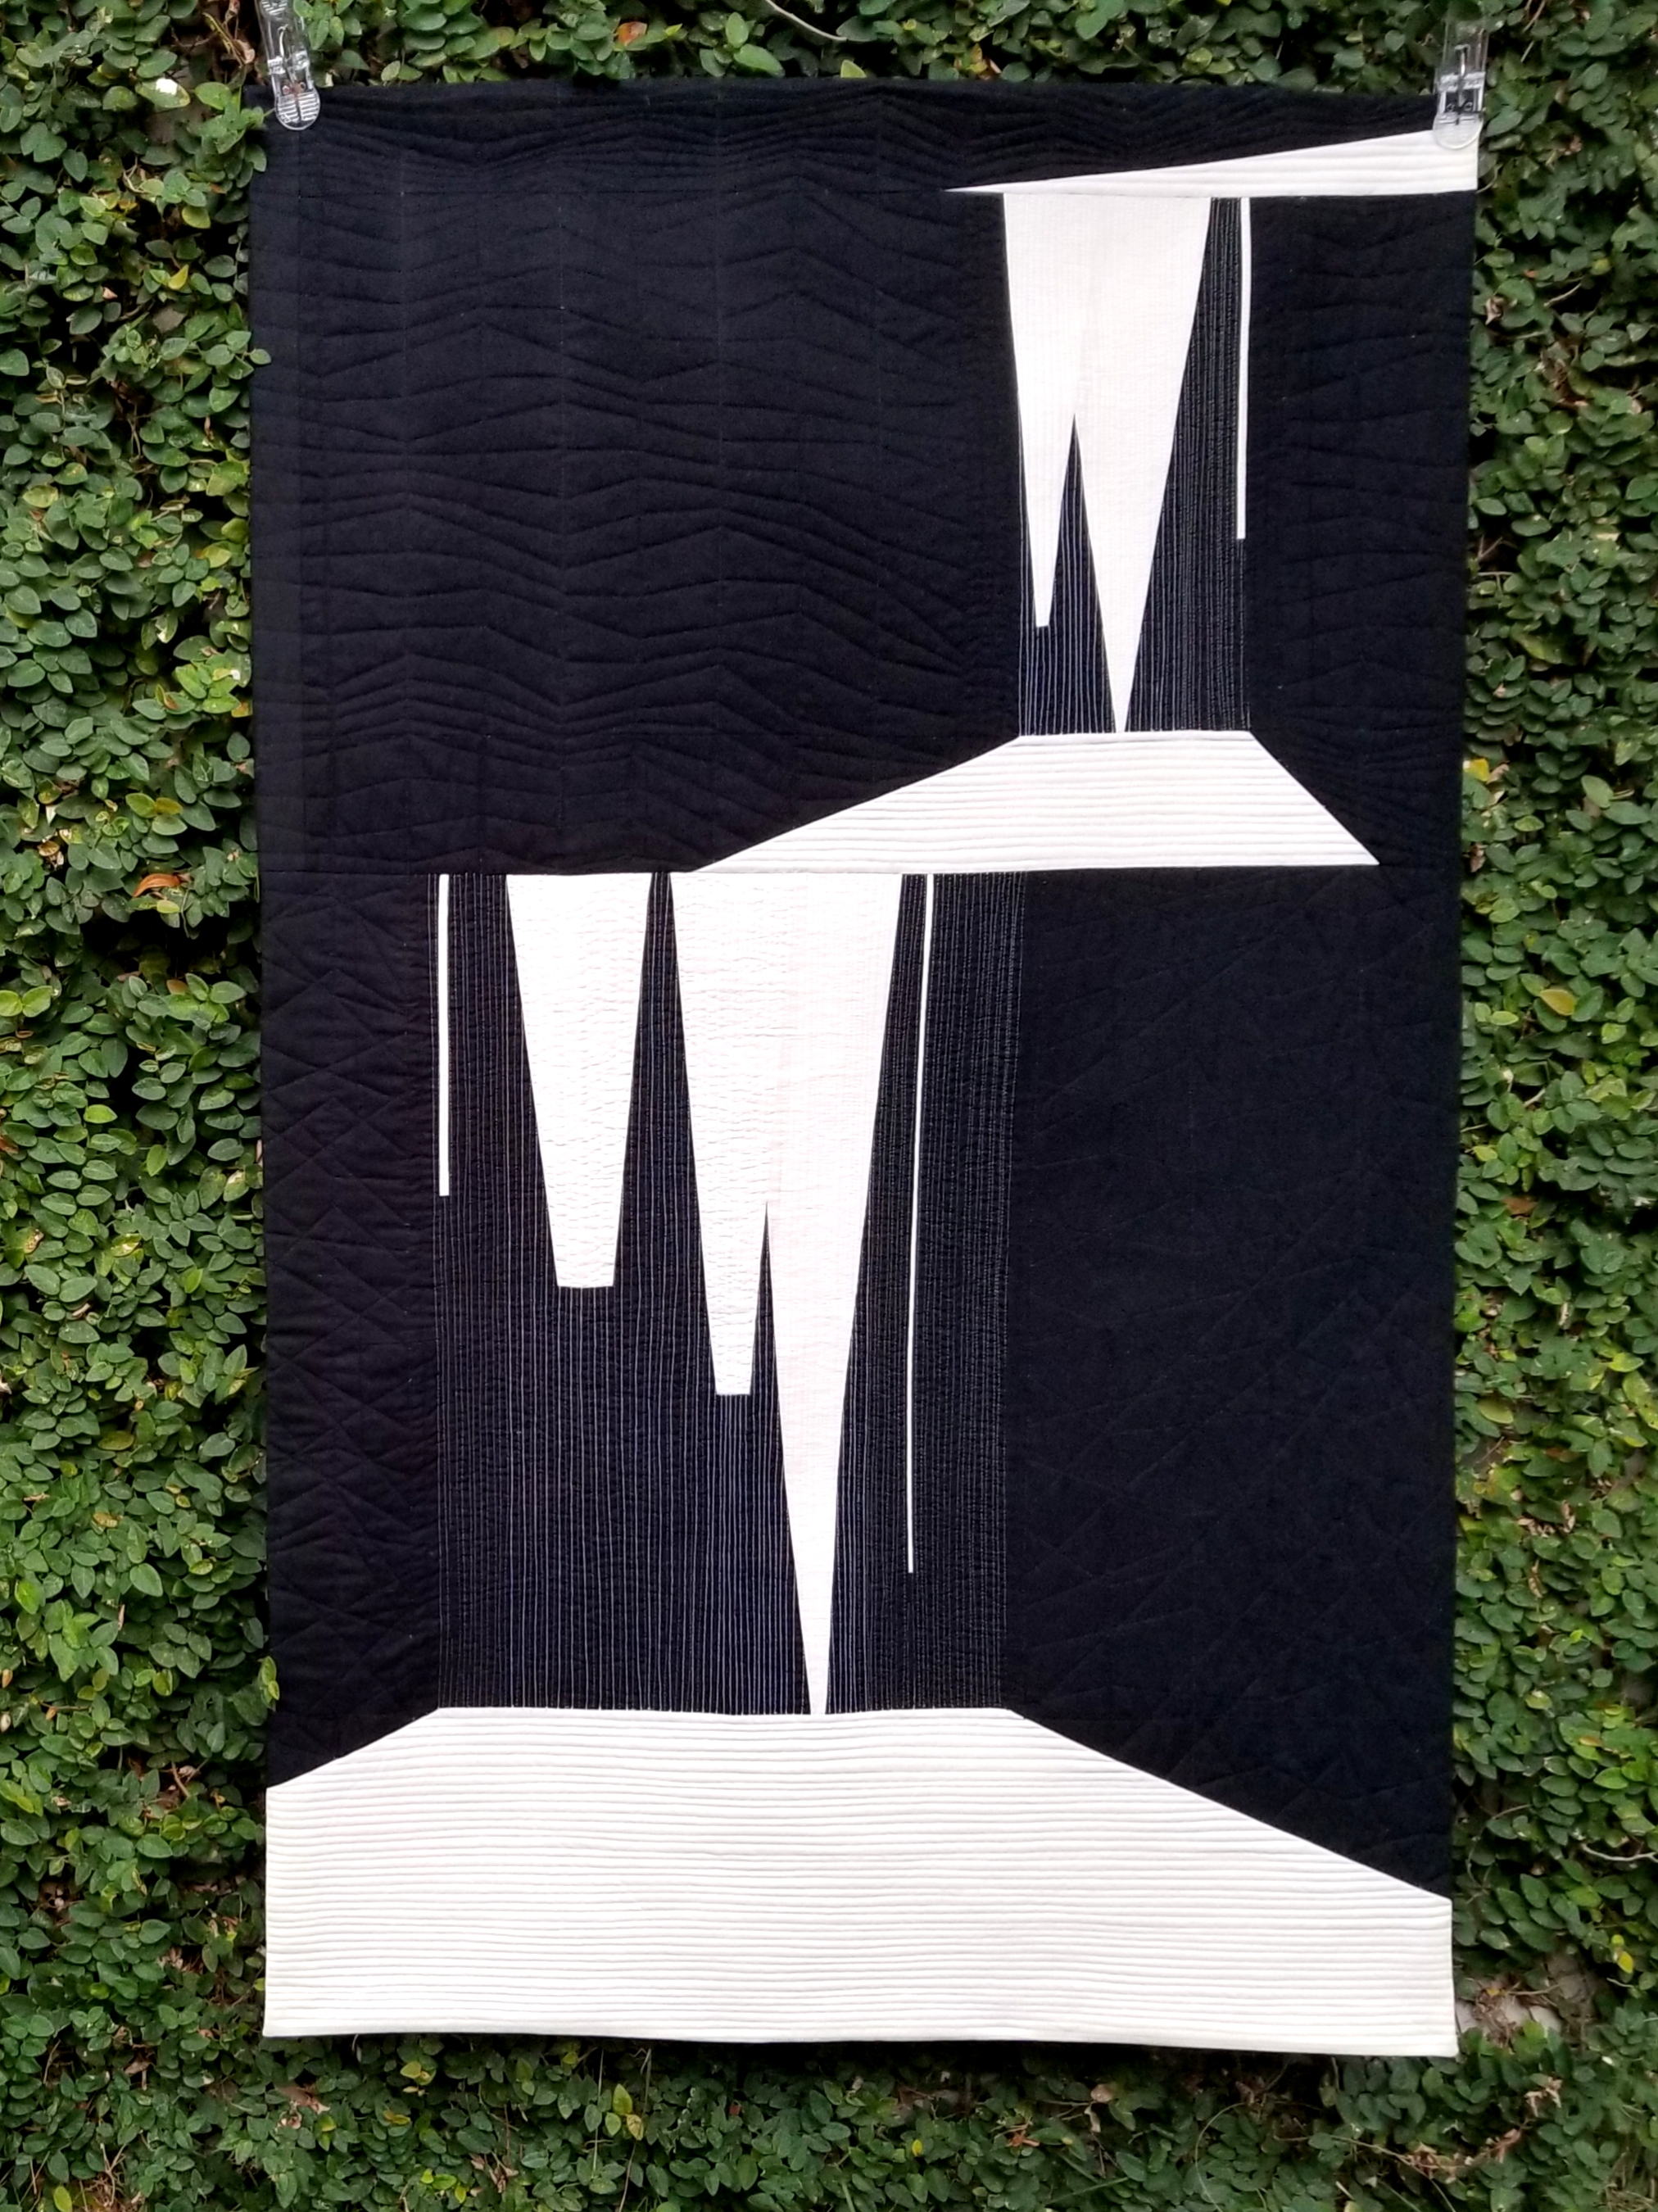 "Waterfall  31.5"" x 50.75"" By Sarah Lauzon Orlando MQG Orlando, Florida @cera.bee"